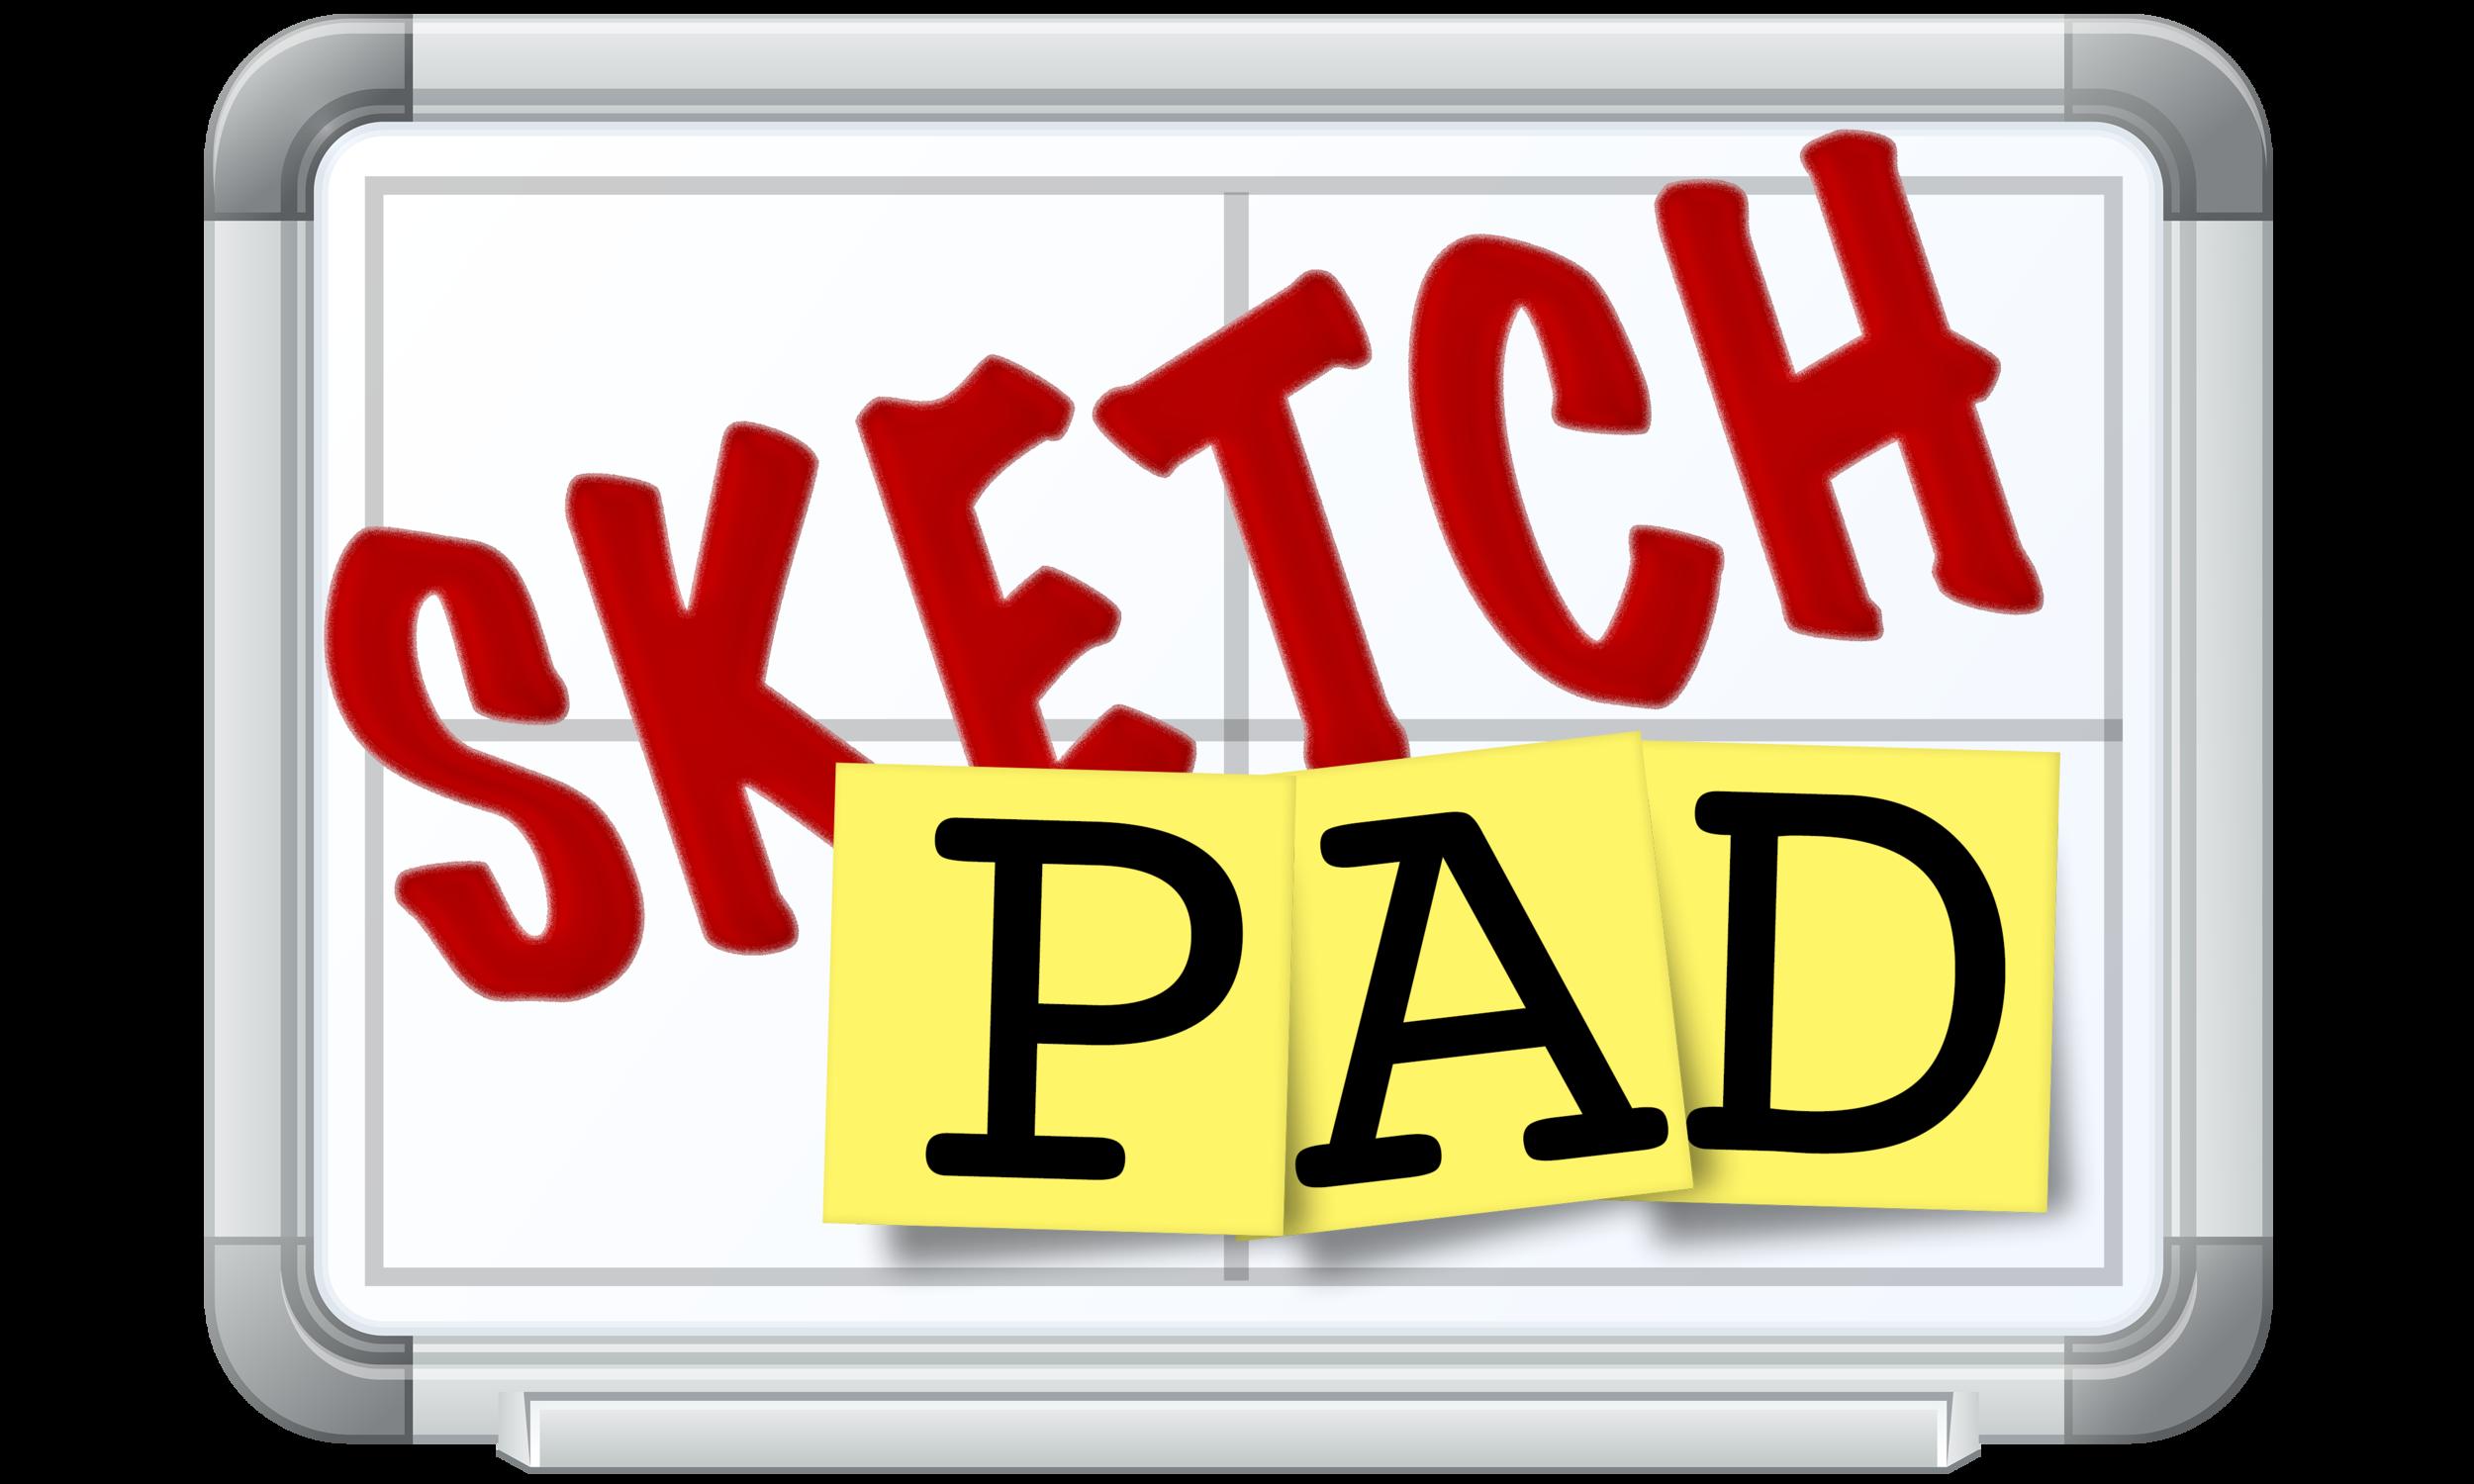 sketchpad2.png